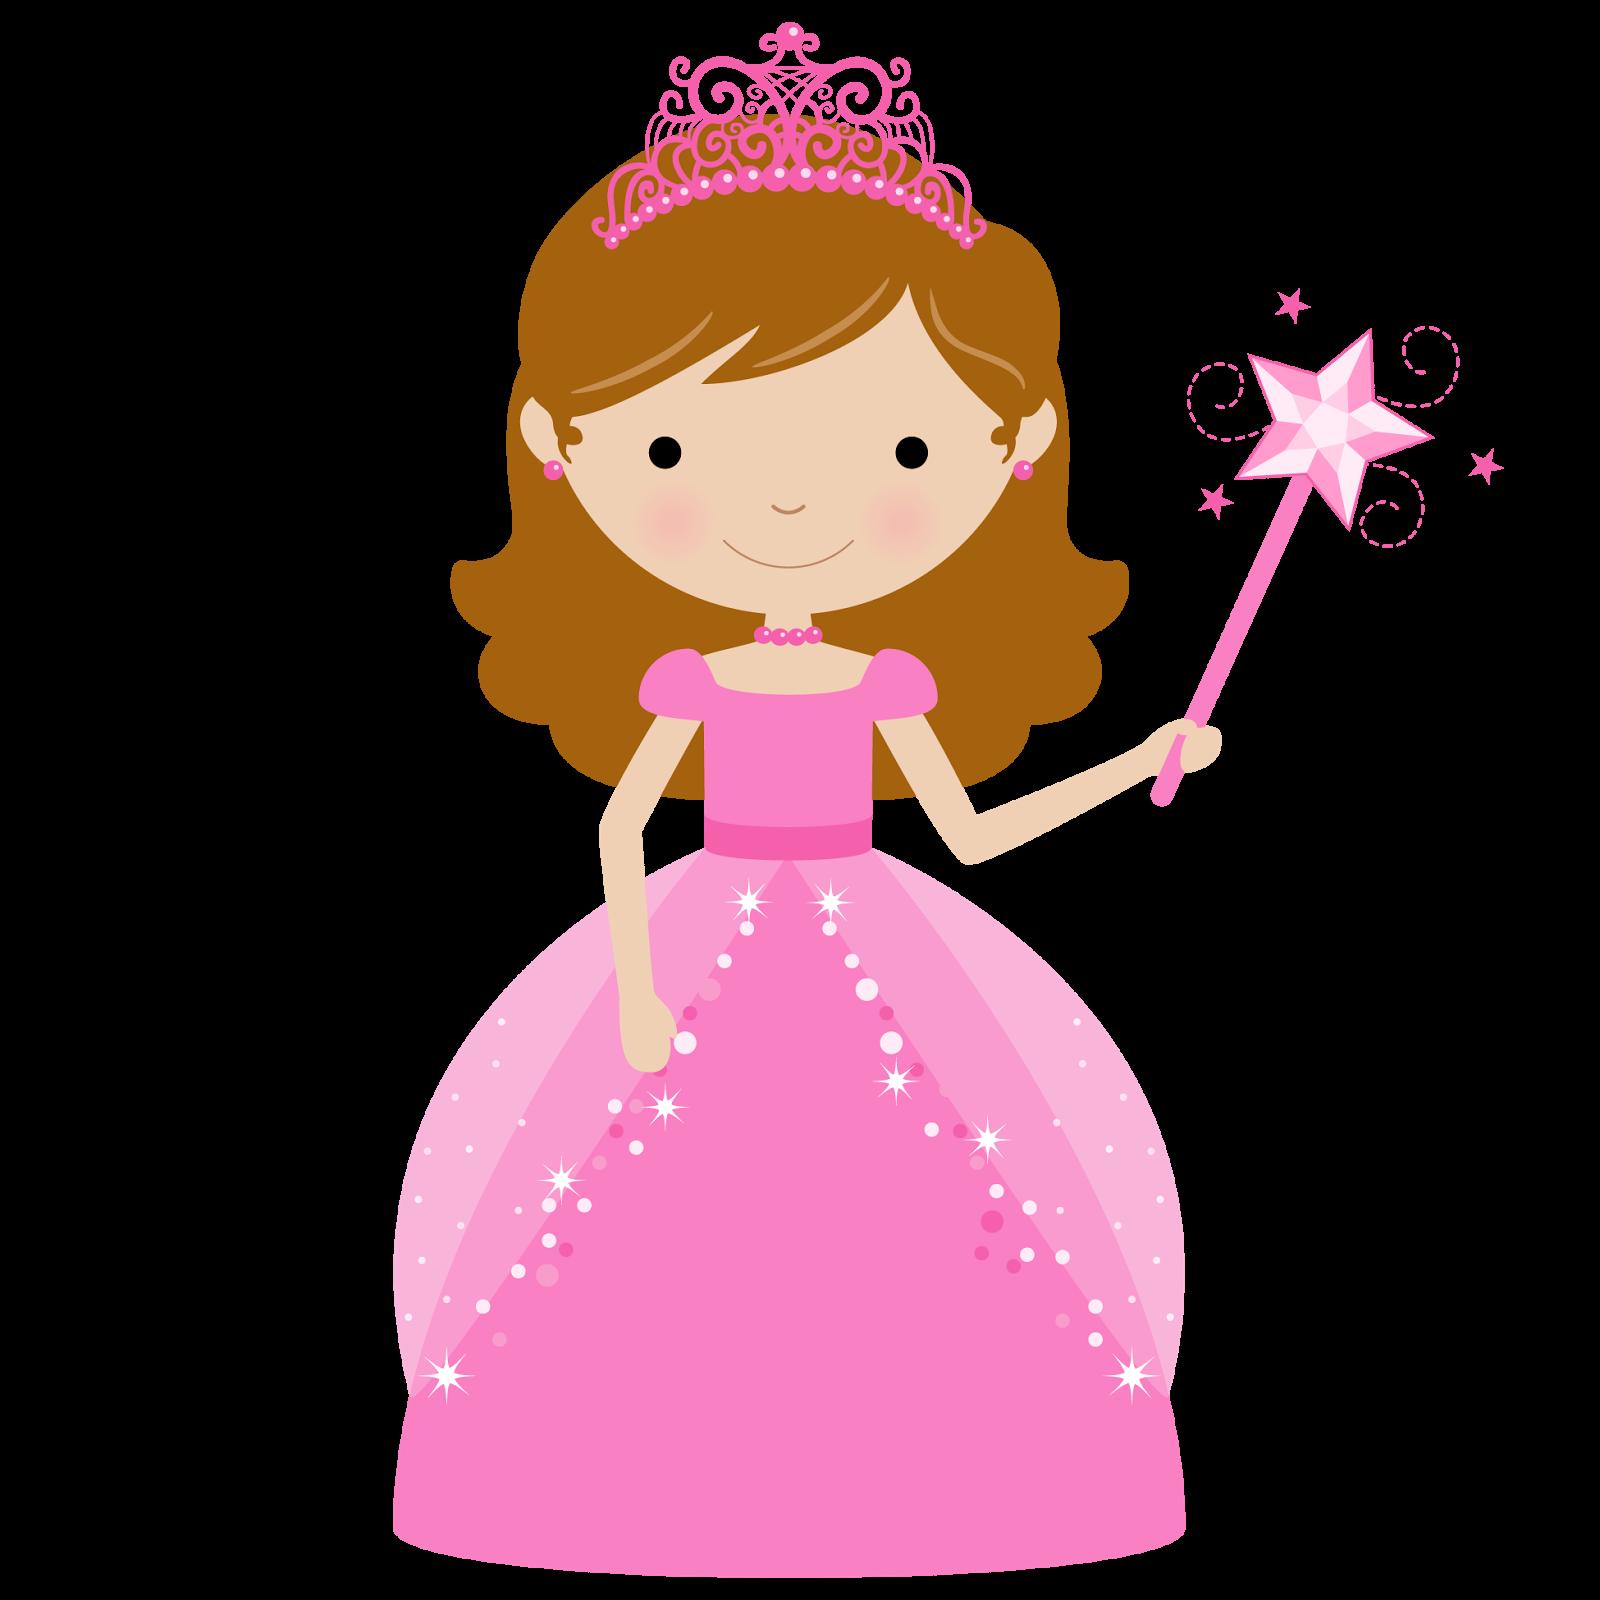 Clipart tierra crown for little girls vector free SGBlogosfera. María José Argüeso: PRINCESAS ENCANTADAS | PRINCESITAS ... vector free